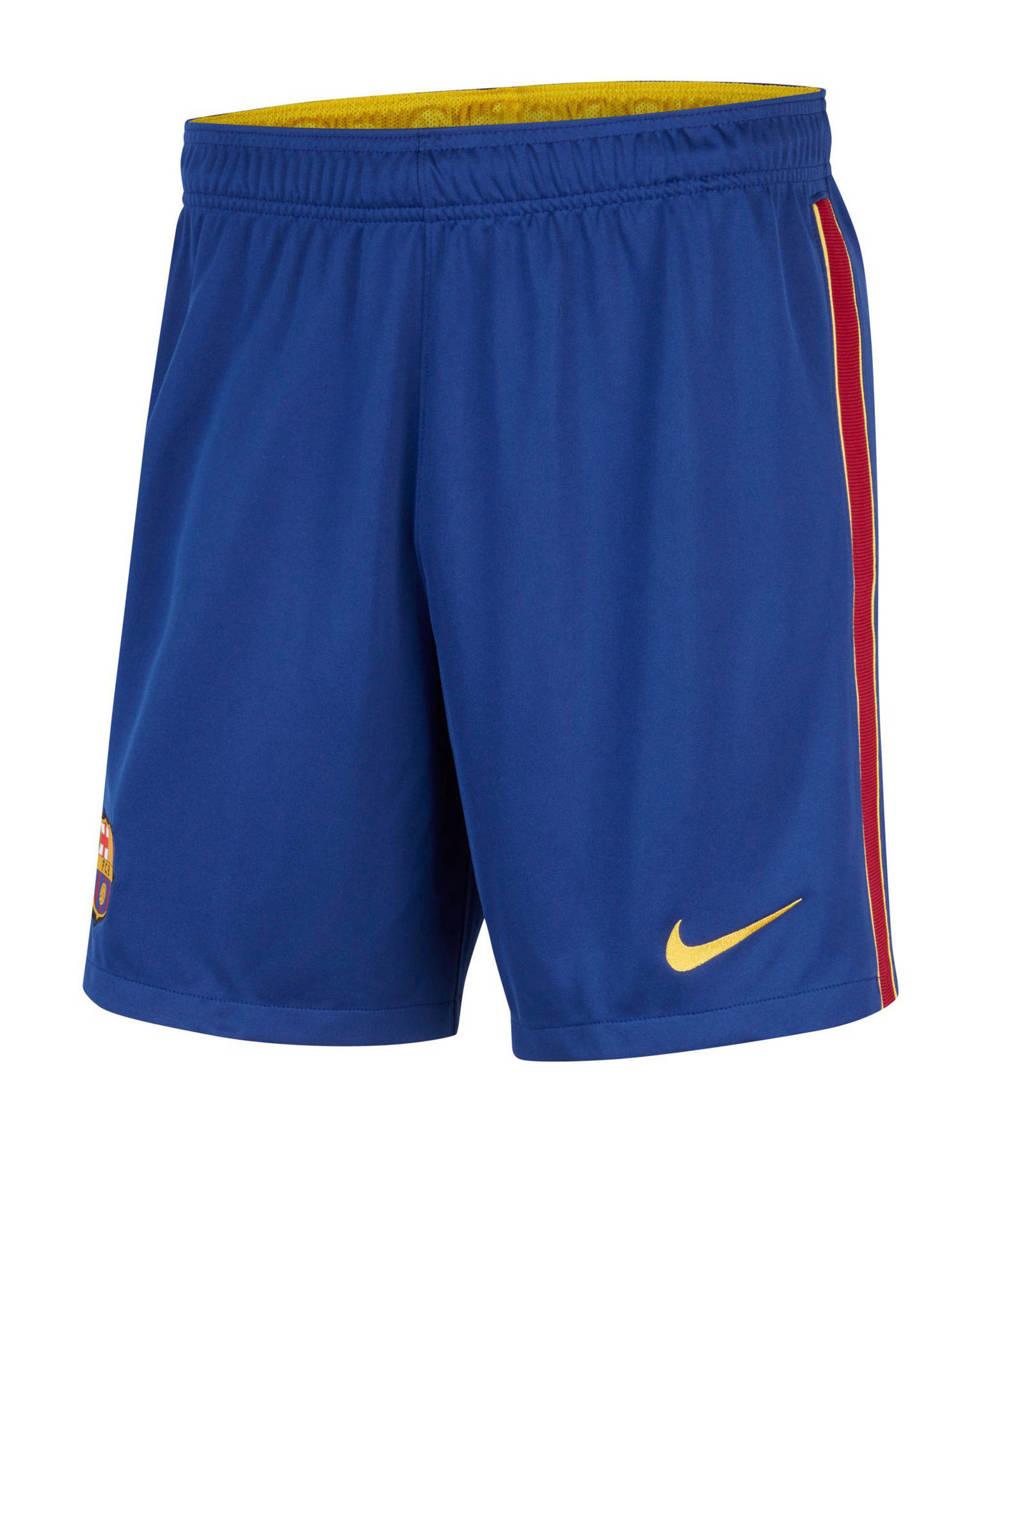 Nike Senior FC Barcelona thuis/uit short blauw, Blau